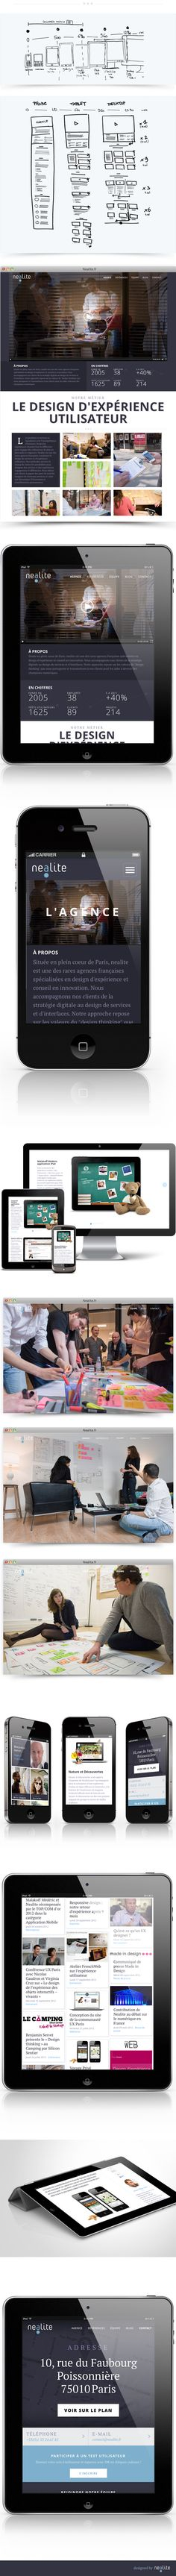 Nealite - responsive design by Nealite , via Behance